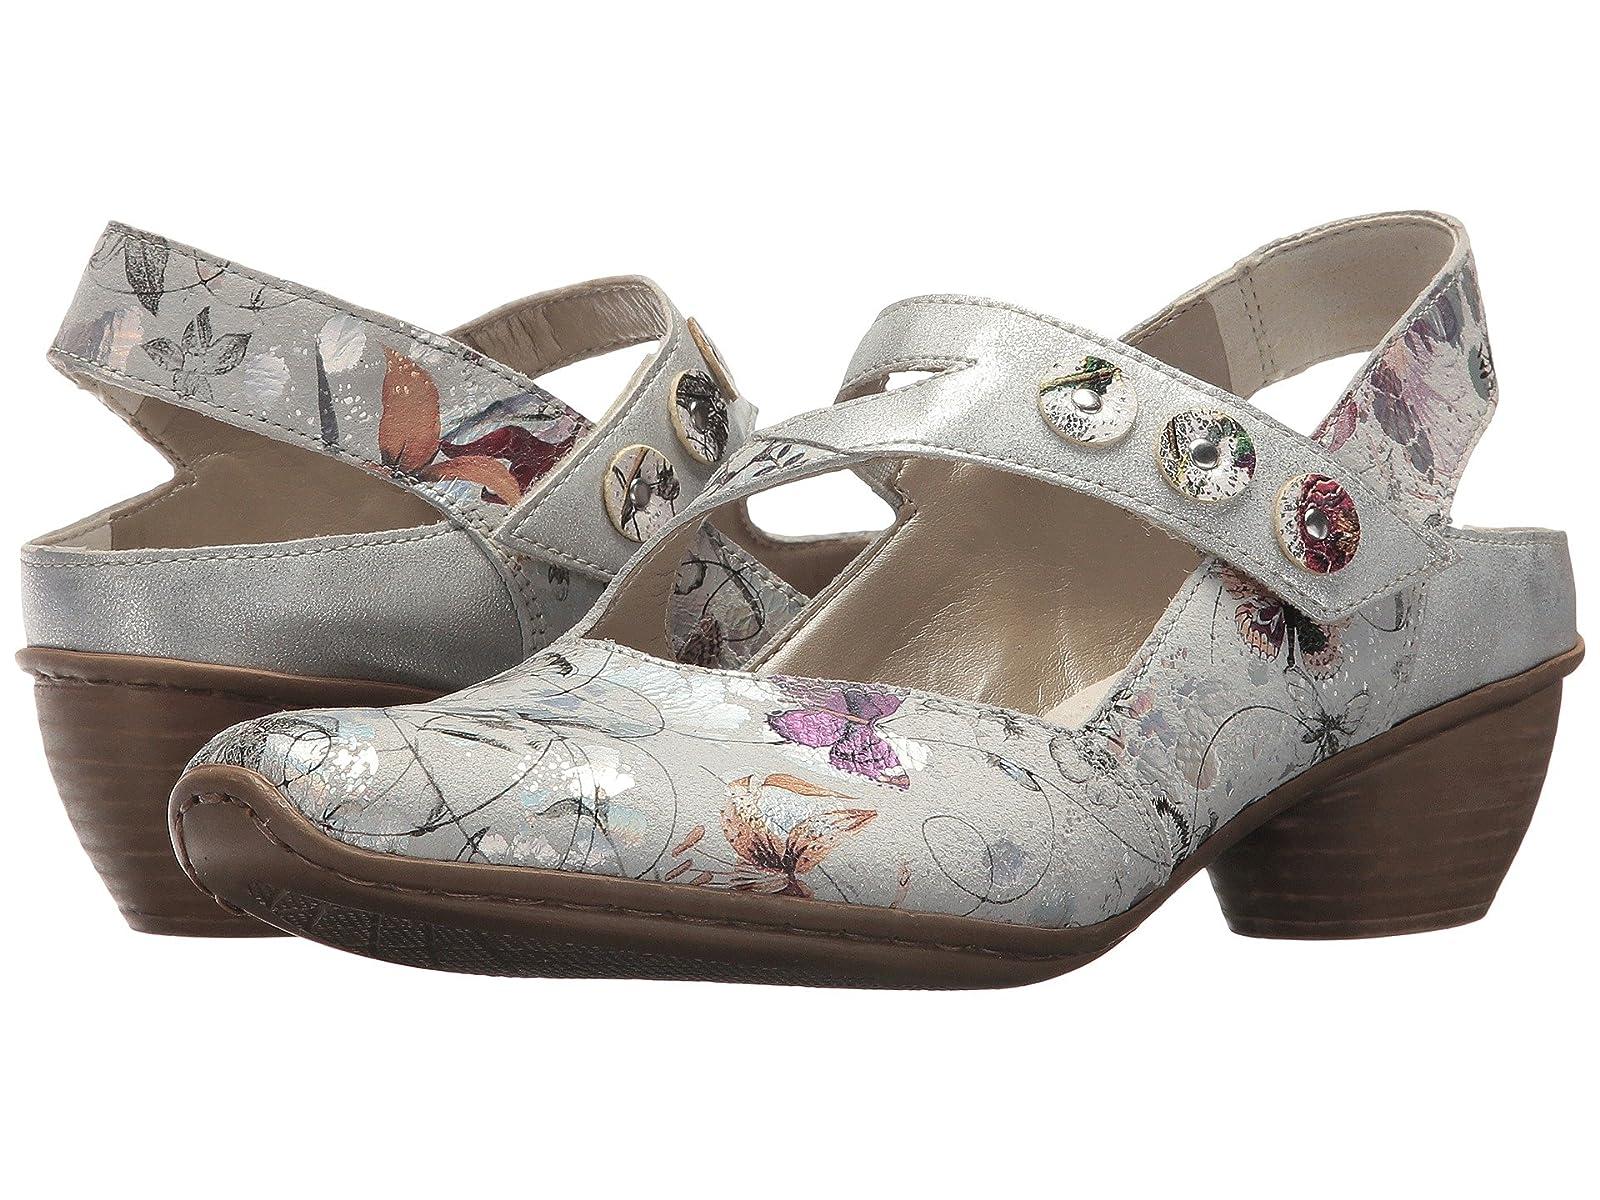 Rieker 43771 Mirjam 71Atmospheric grades have affordable shoes